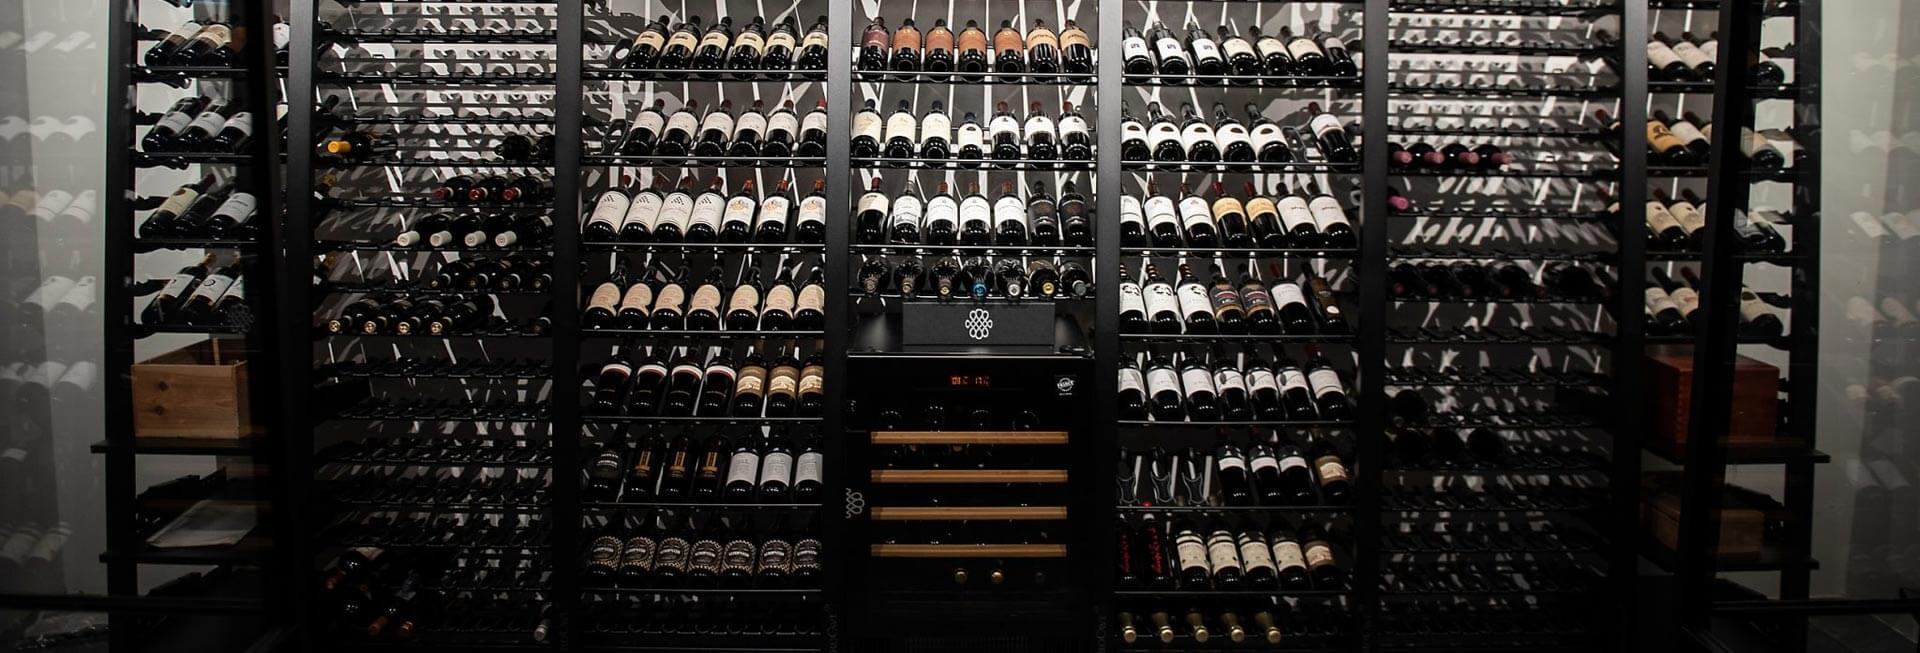 EuroCave Modulosteel Wine Racking Header